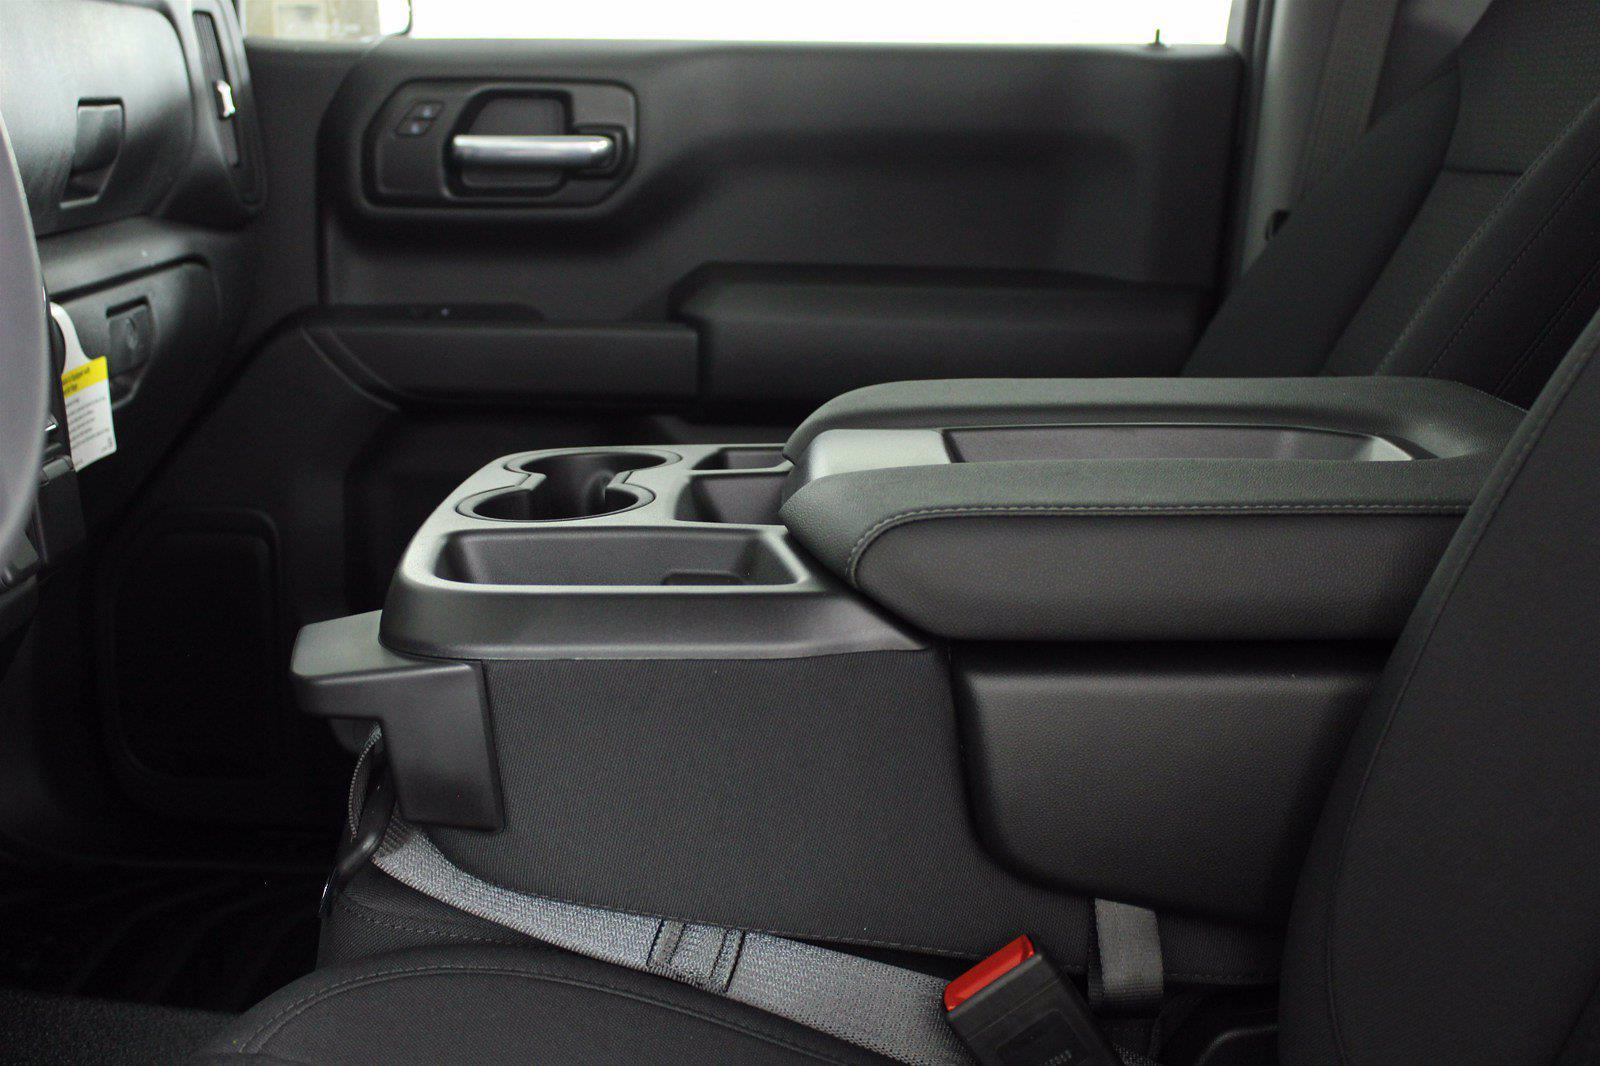 2021 GMC Sierra 1500 Regular Cab 4x4, Pickup #D411083 - photo 12